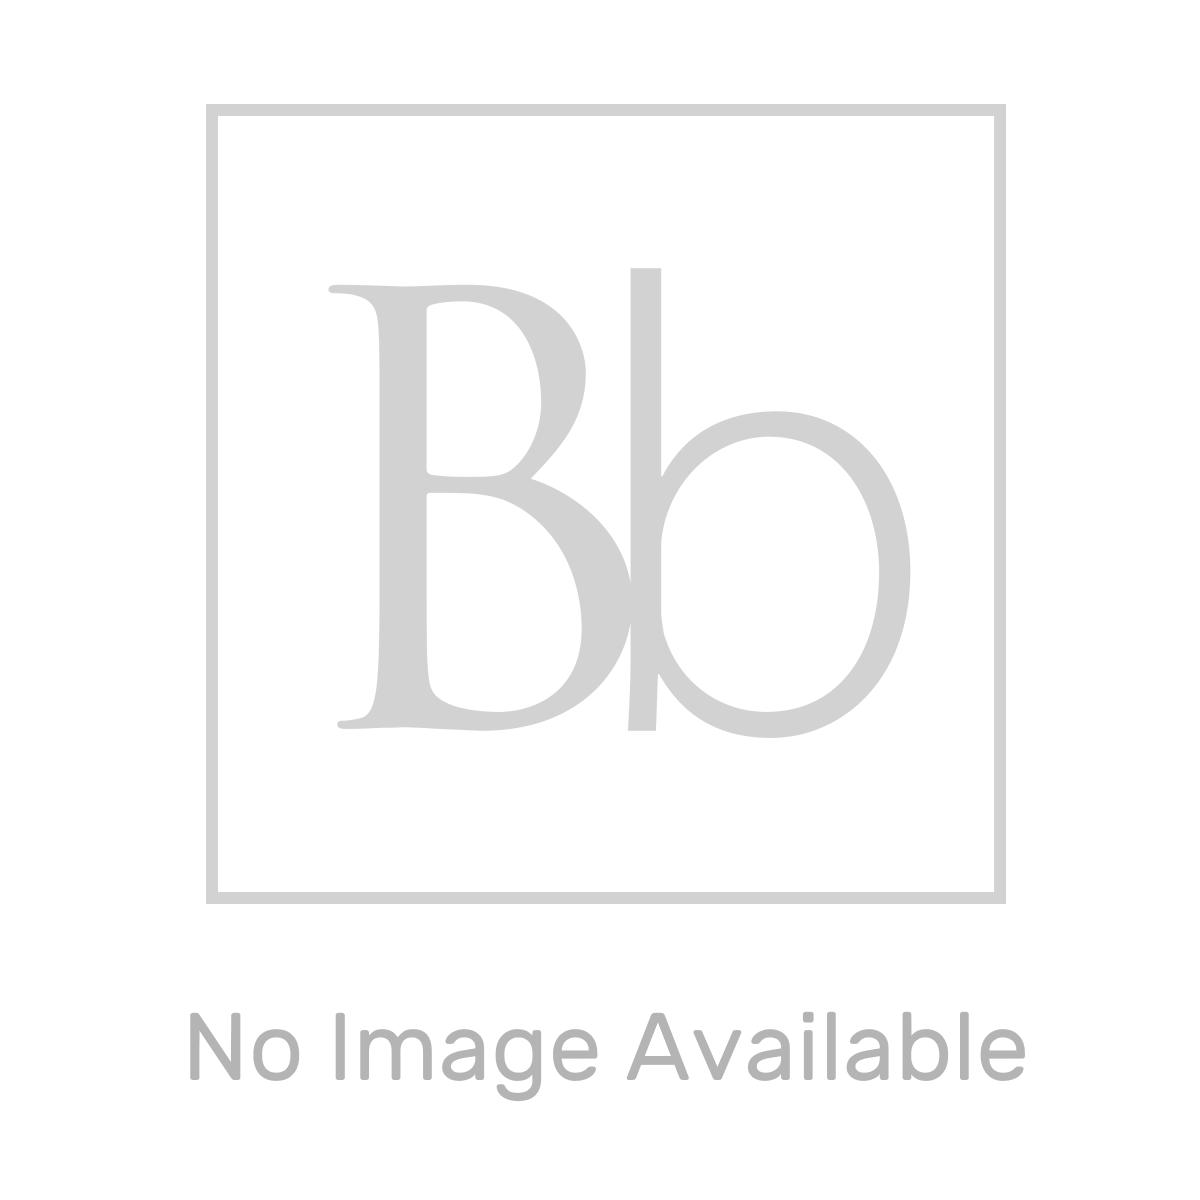 Rak Slide Stainless Steel Sliding Door Mirrored Cabinet 460mm